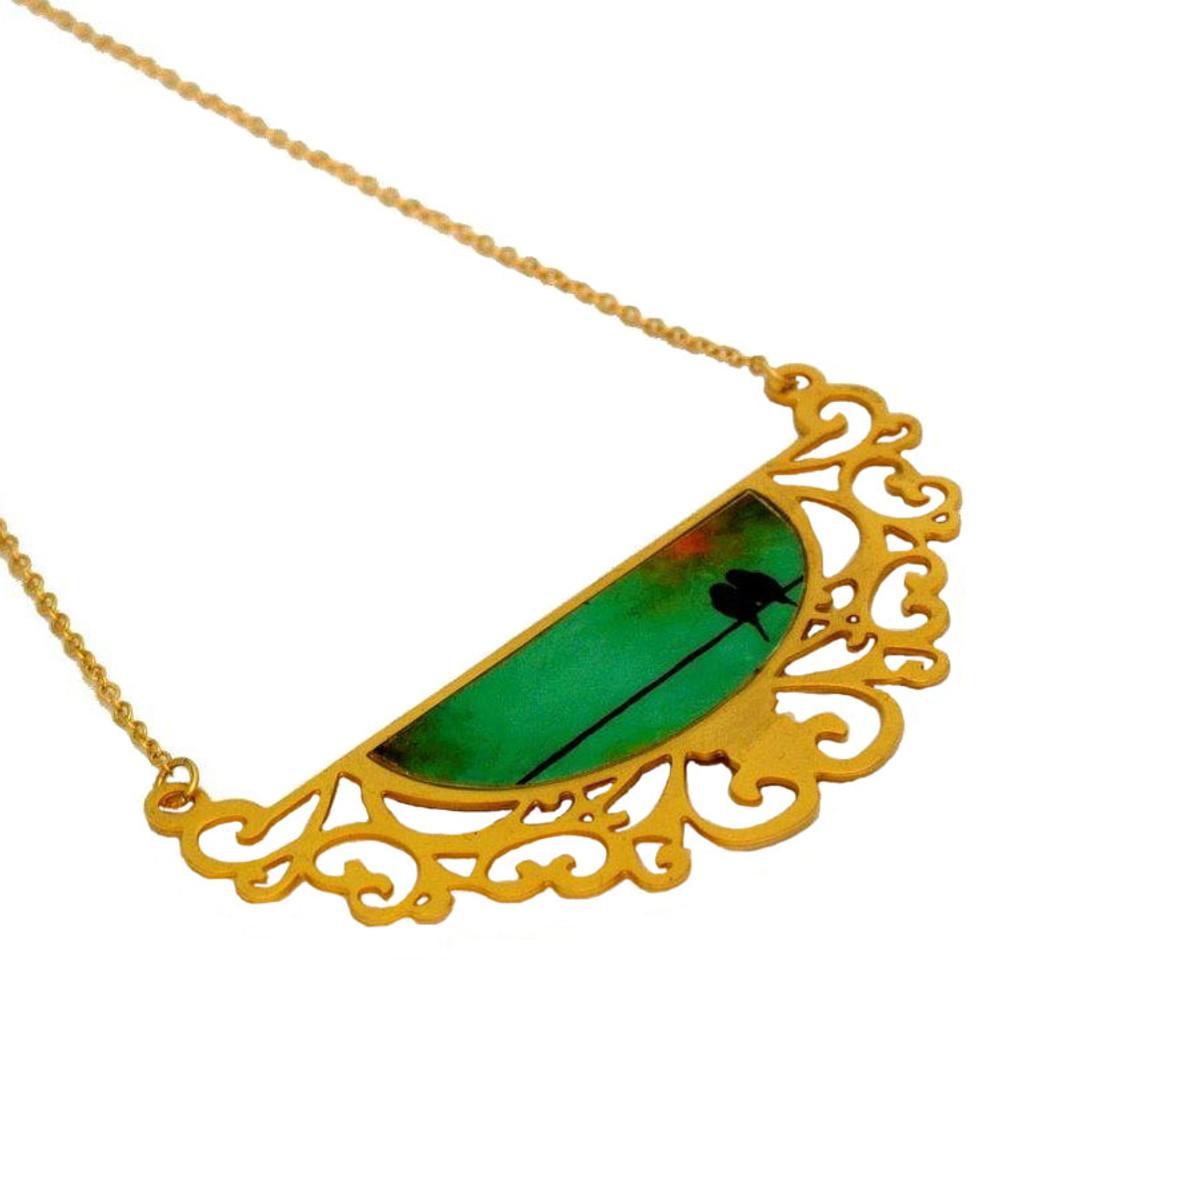 Iris Designs Lovebirds Necklace